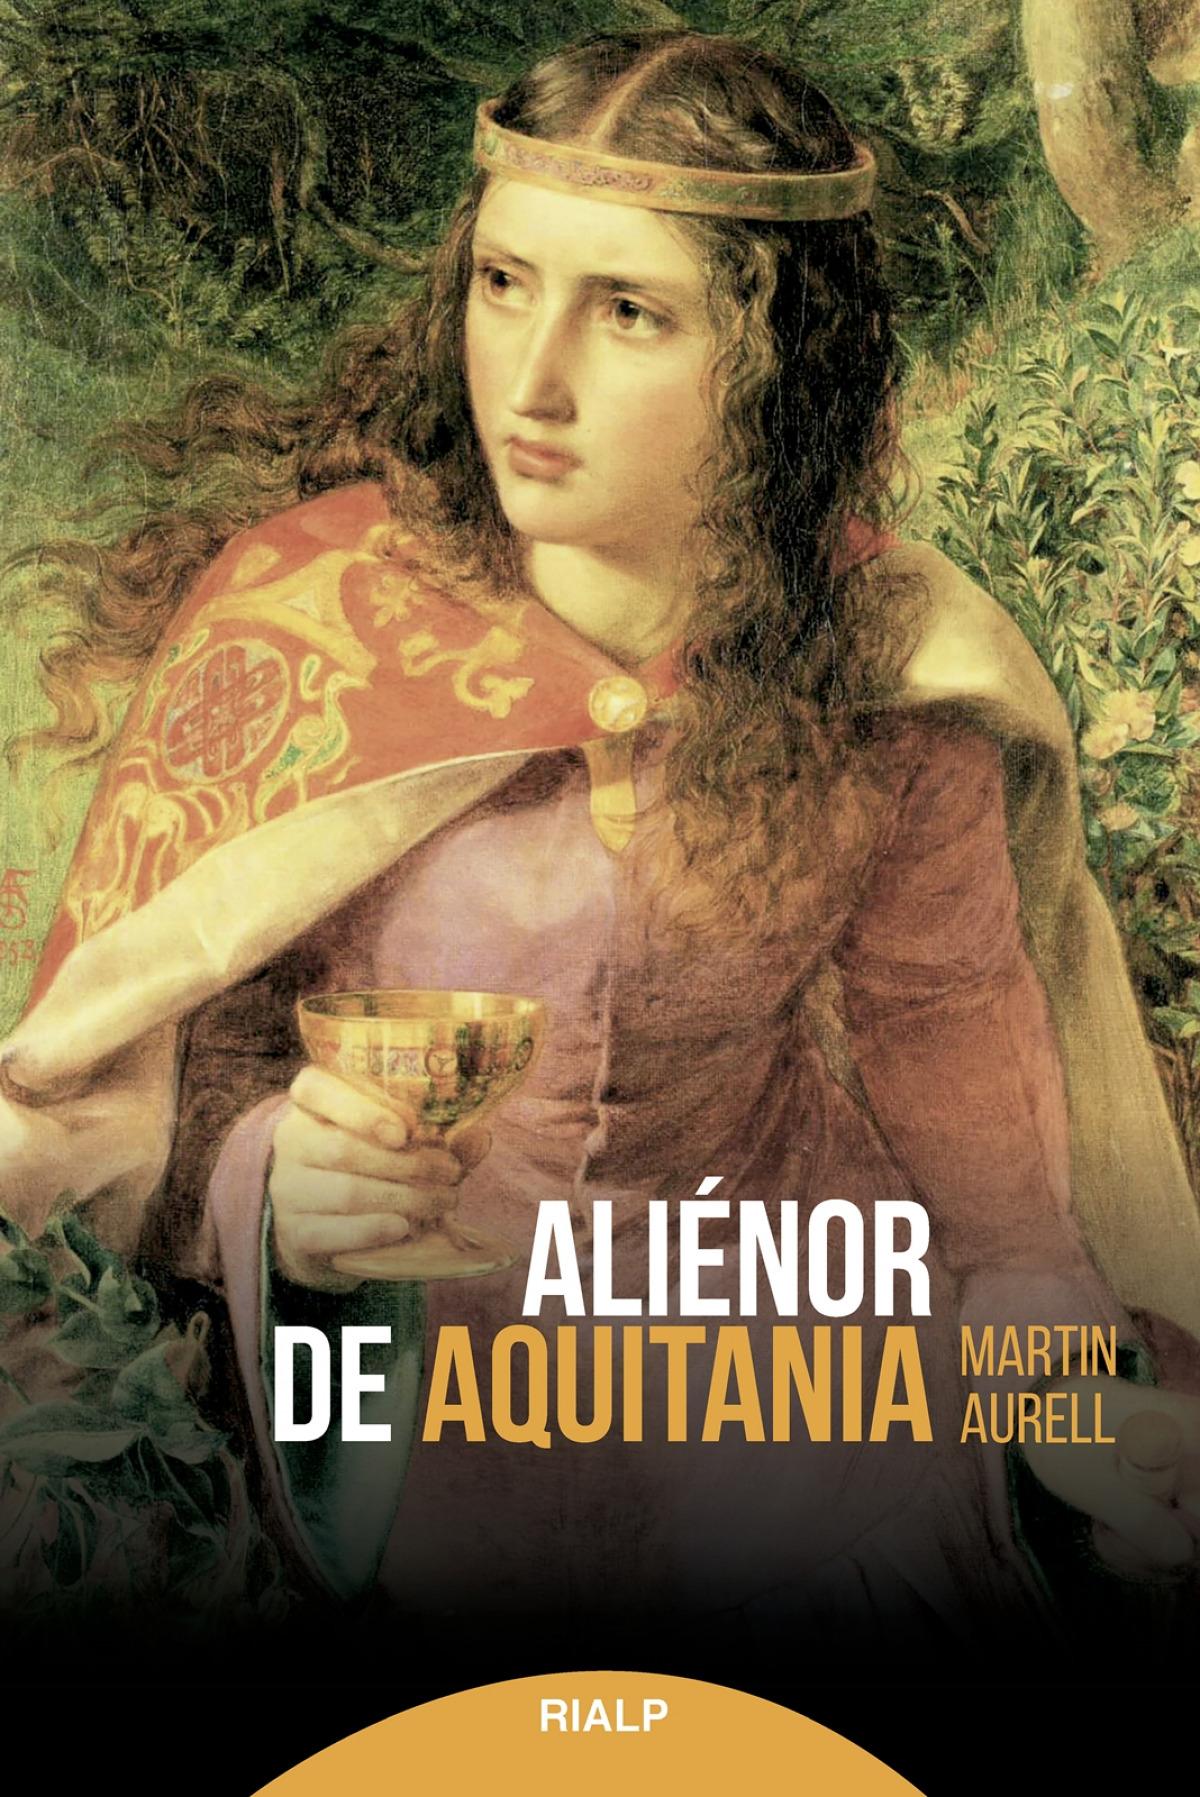 Aliénor de Aquitania 9788432153693